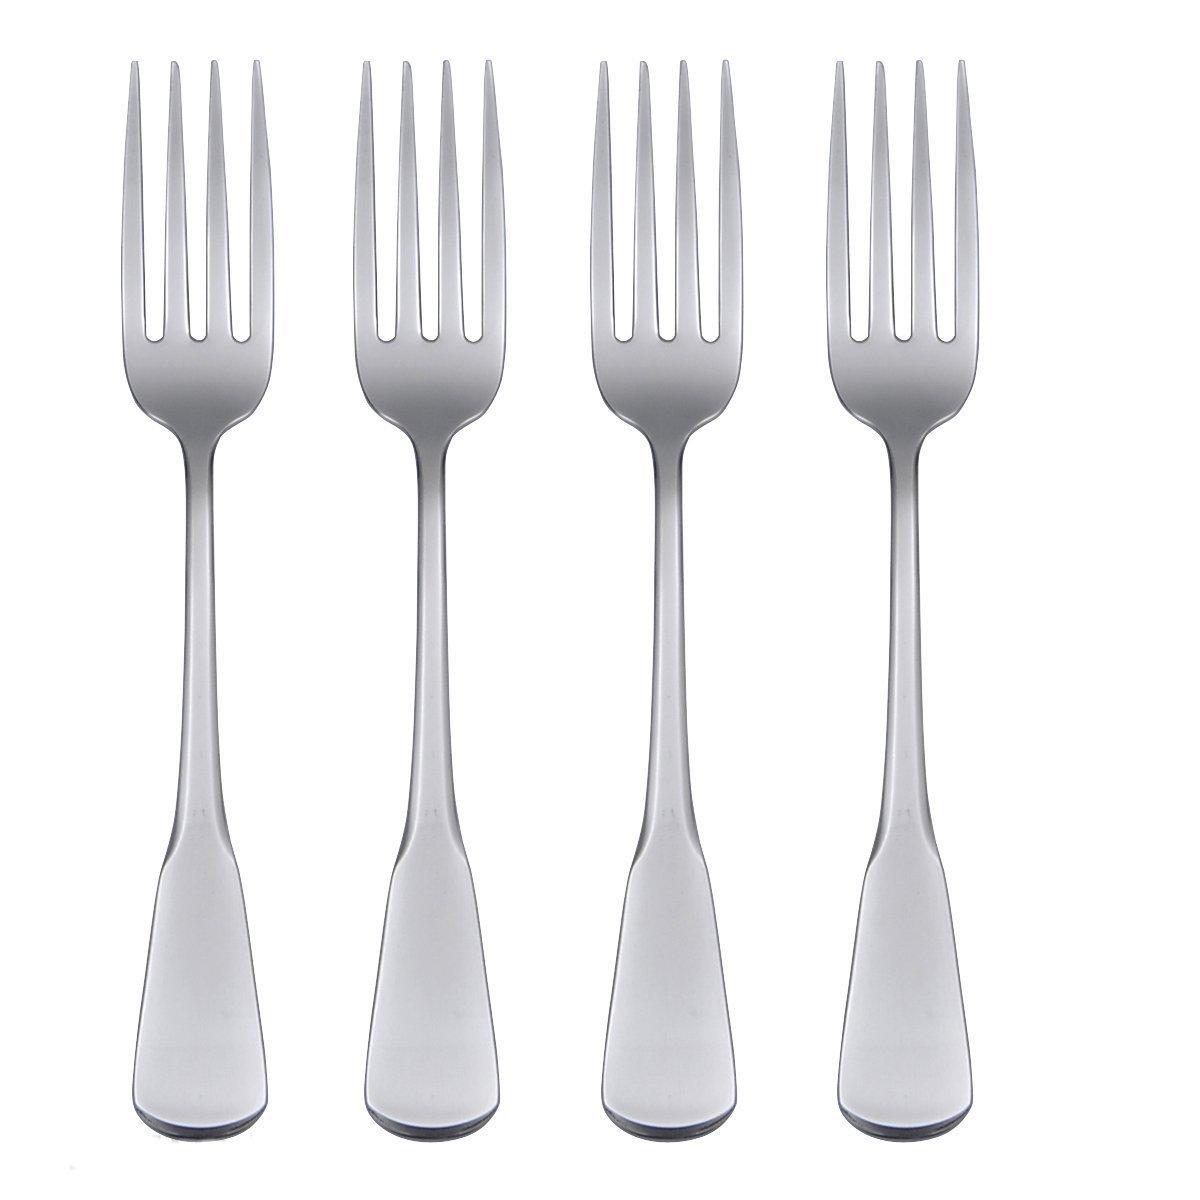 Oneida Flatware Colonial Boston Dinner Forks, Set of 4,Silver by Oneida (Image #1)